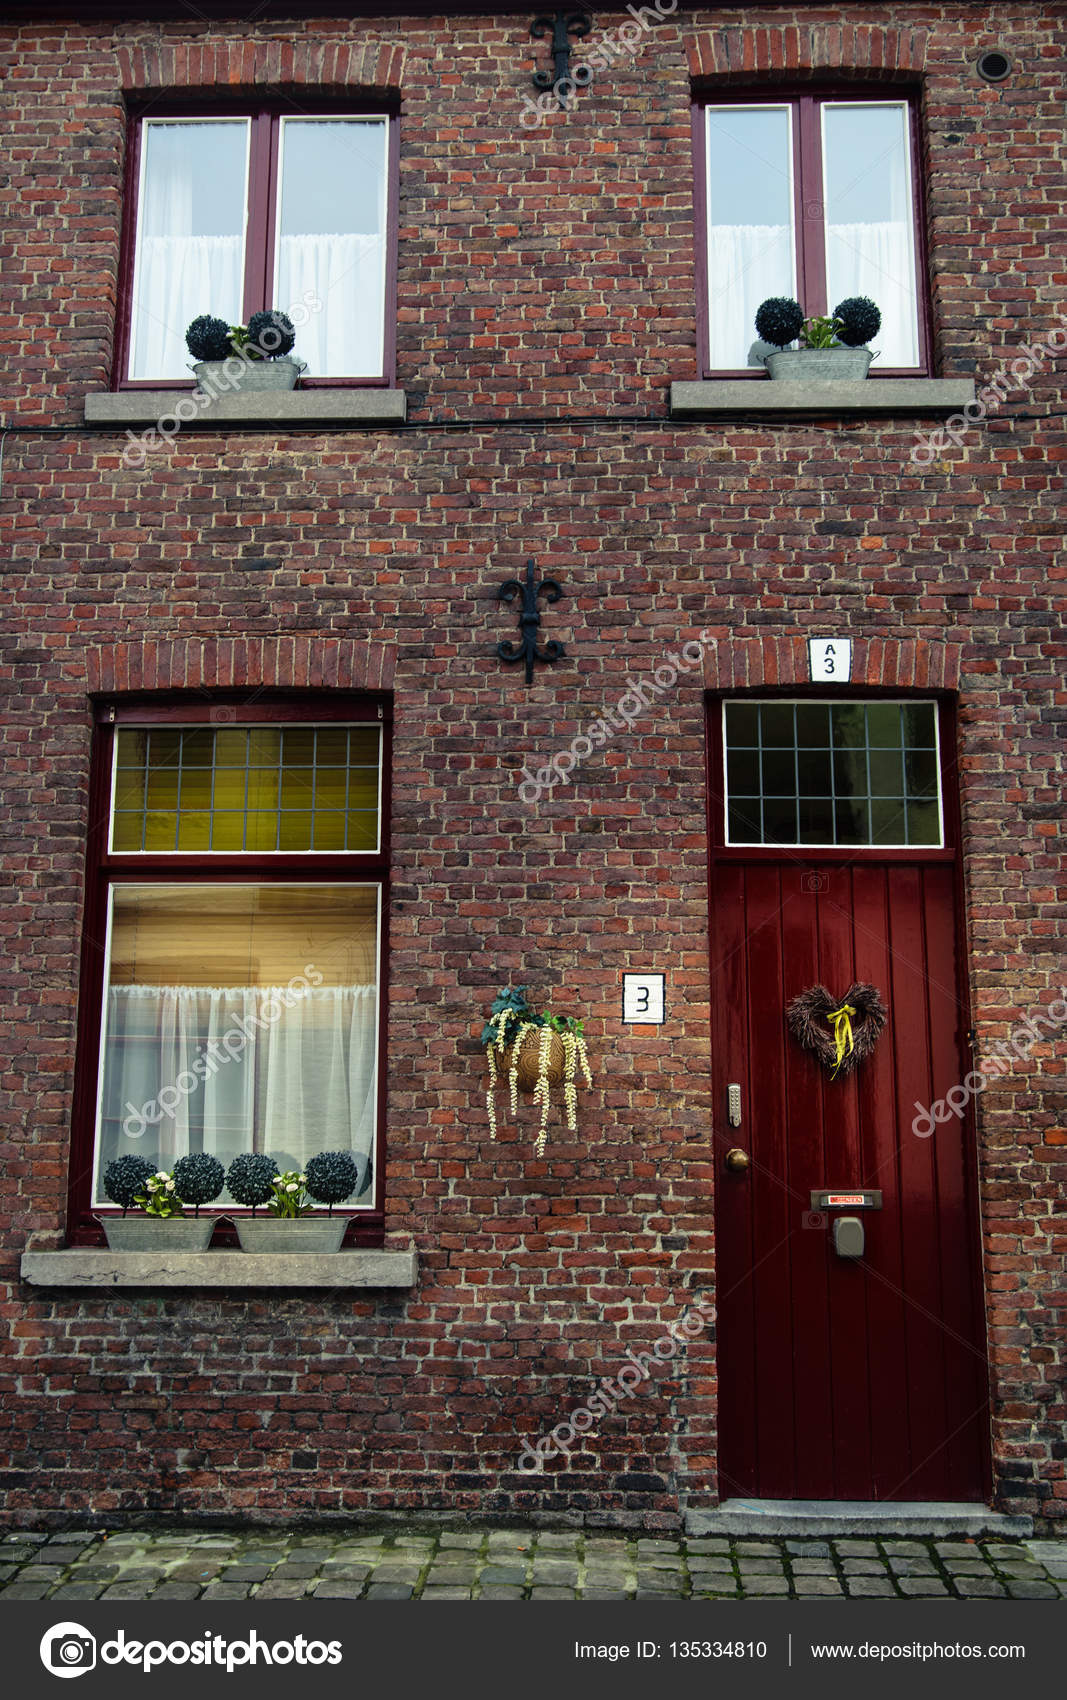 https://st3.depositphotos.com/4106437/13533/i/1600/depositphotos_135334810-stockafbeelding-drie-rode-houten-ramen-met.jpg